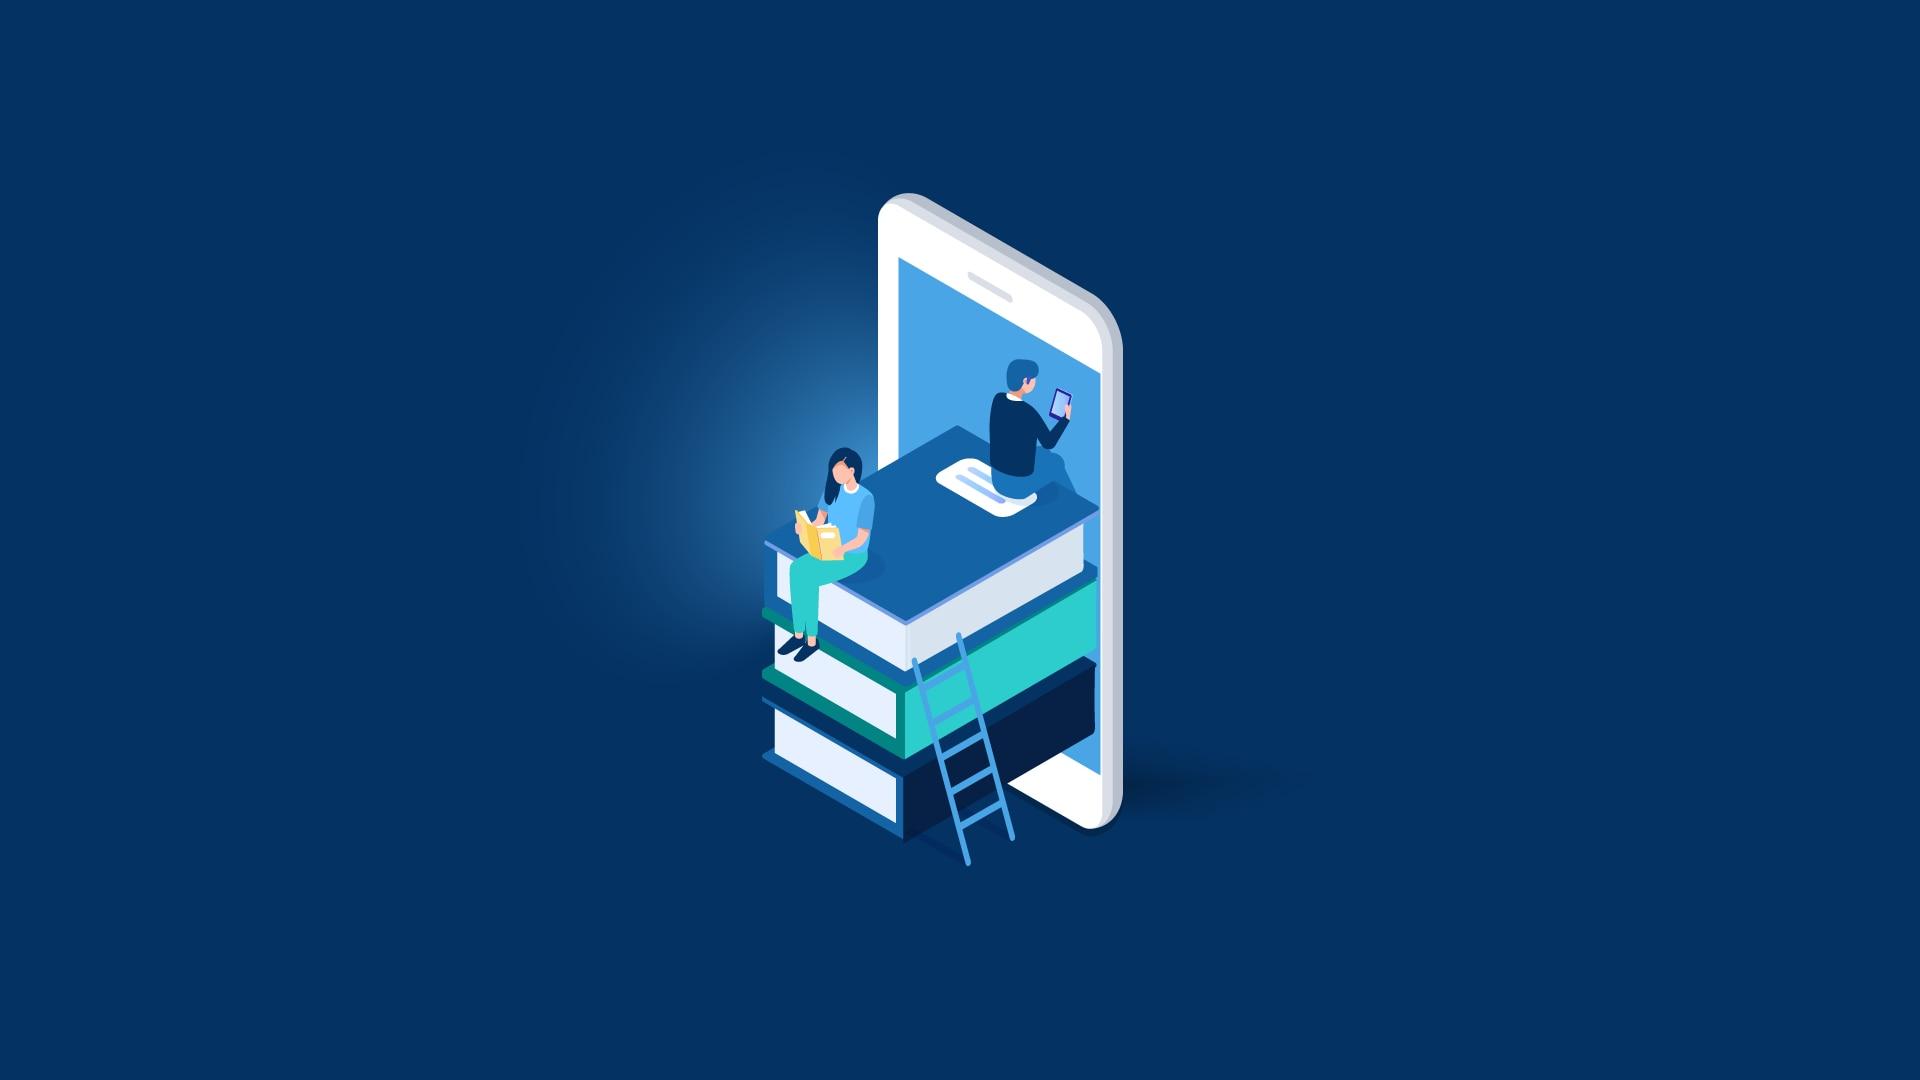 empresas-digitales-educacion-bbva-momentum